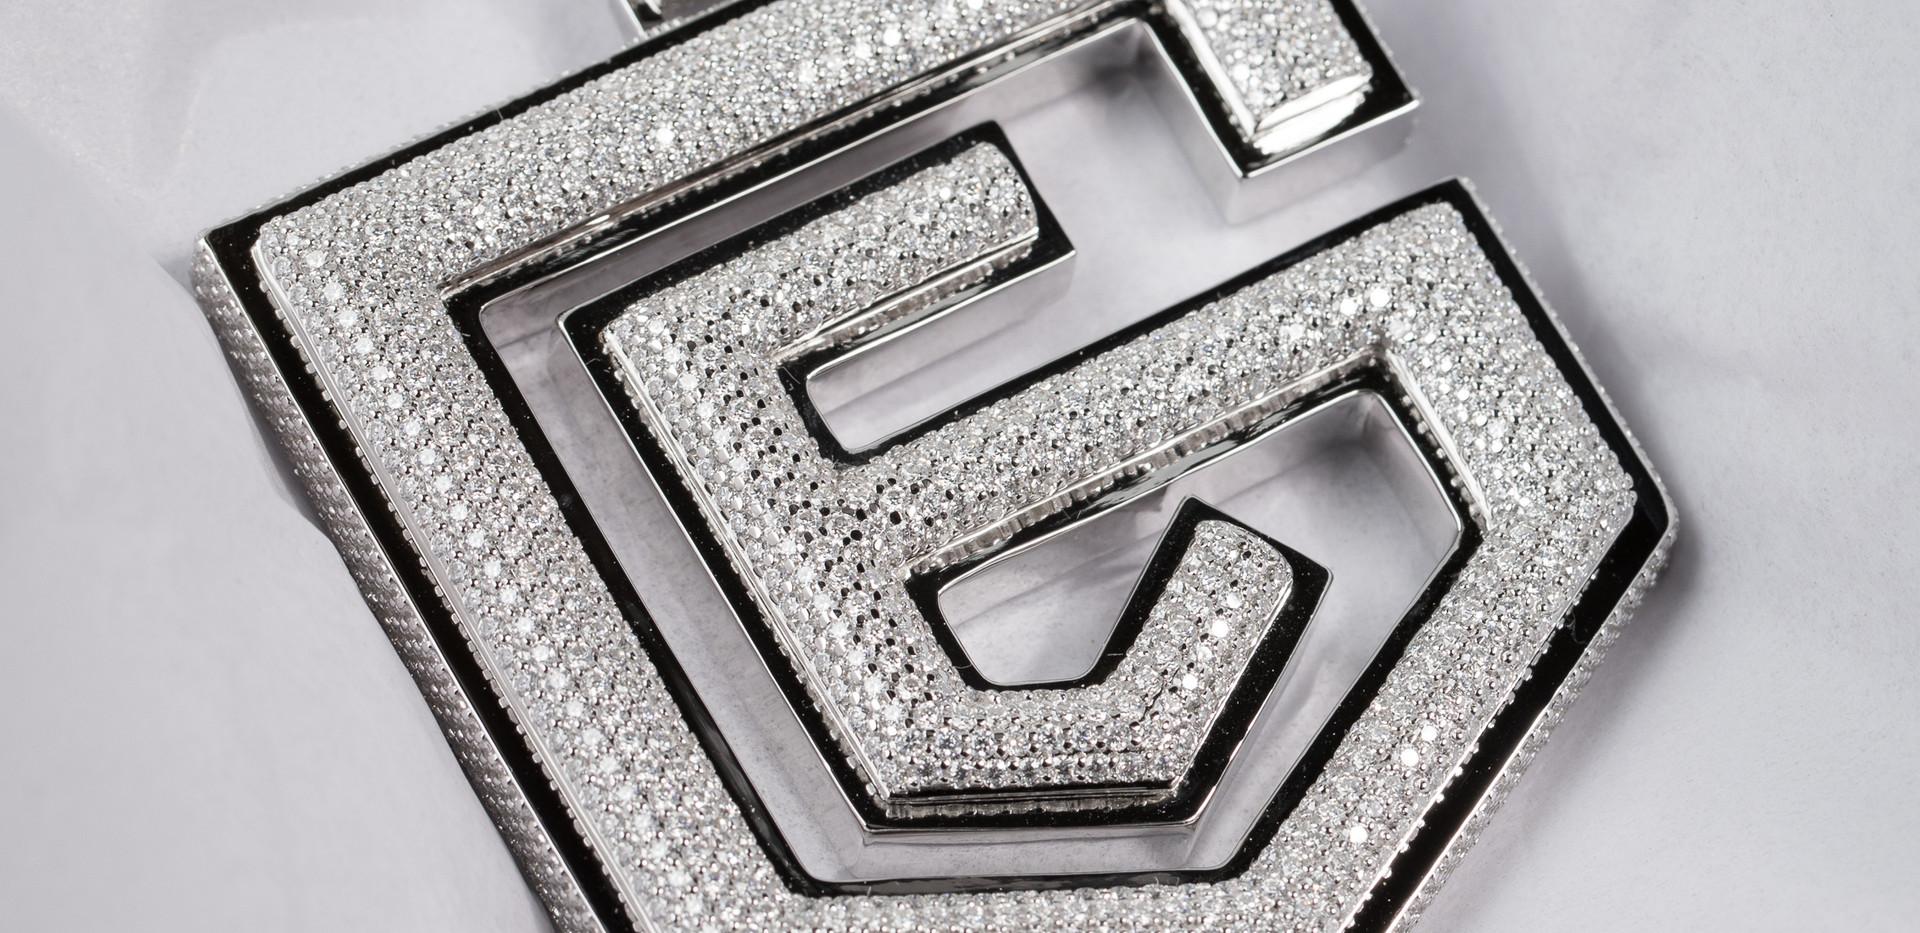 EG Designed By. Tim Da Jeweler